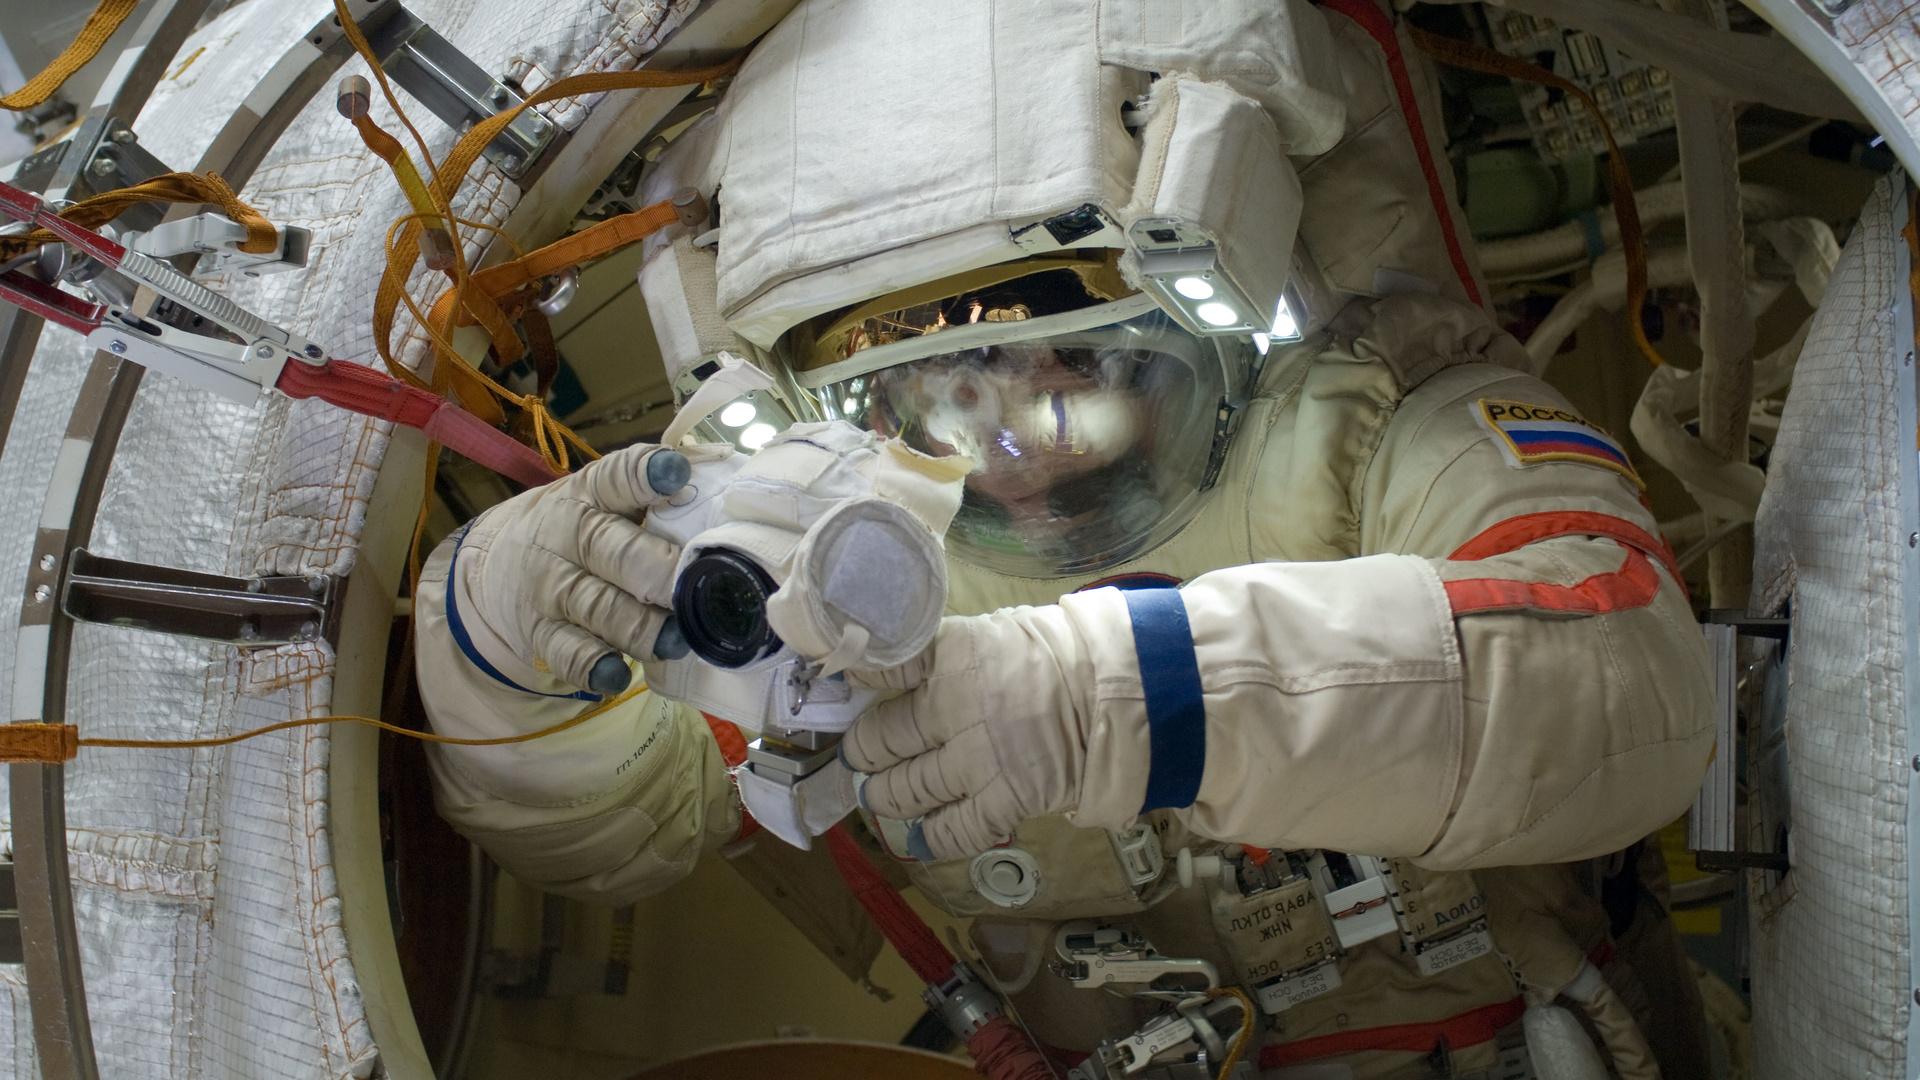 космонавт, скафандр, перчатки